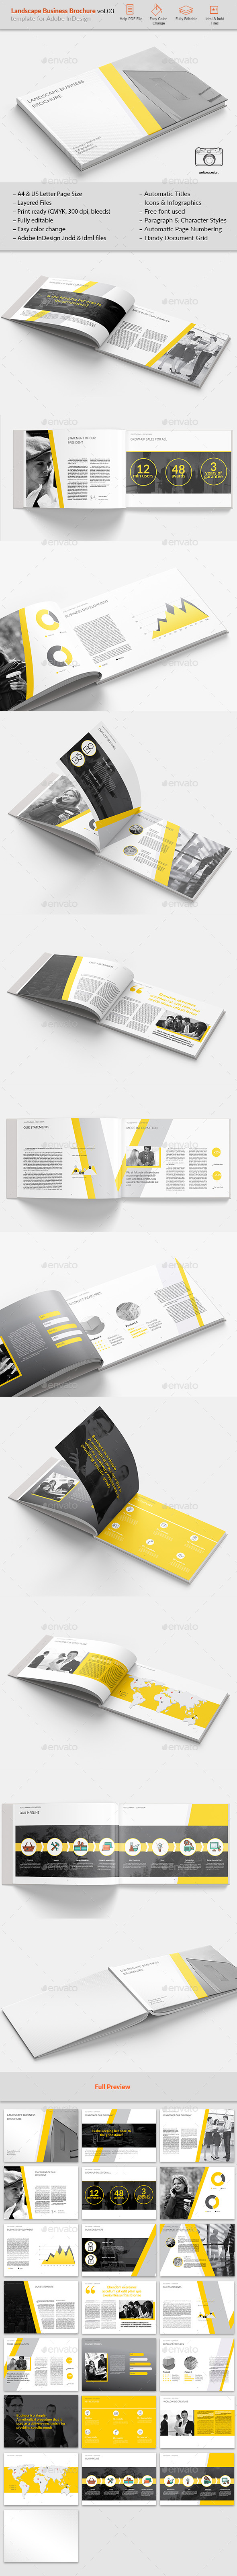 Landsape Business Brochure vol.03 - Brochures Print Templates